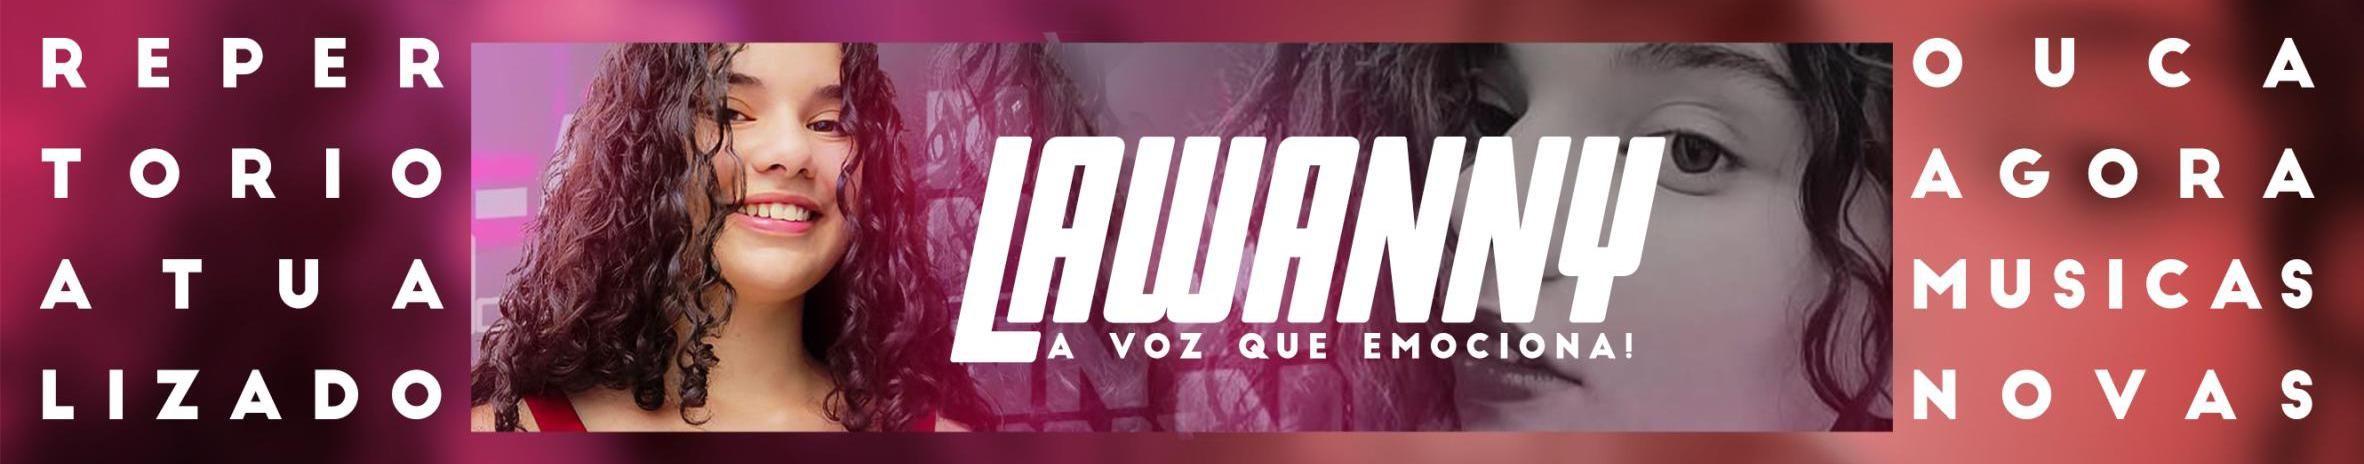 Imagem de capa de LAWANNY